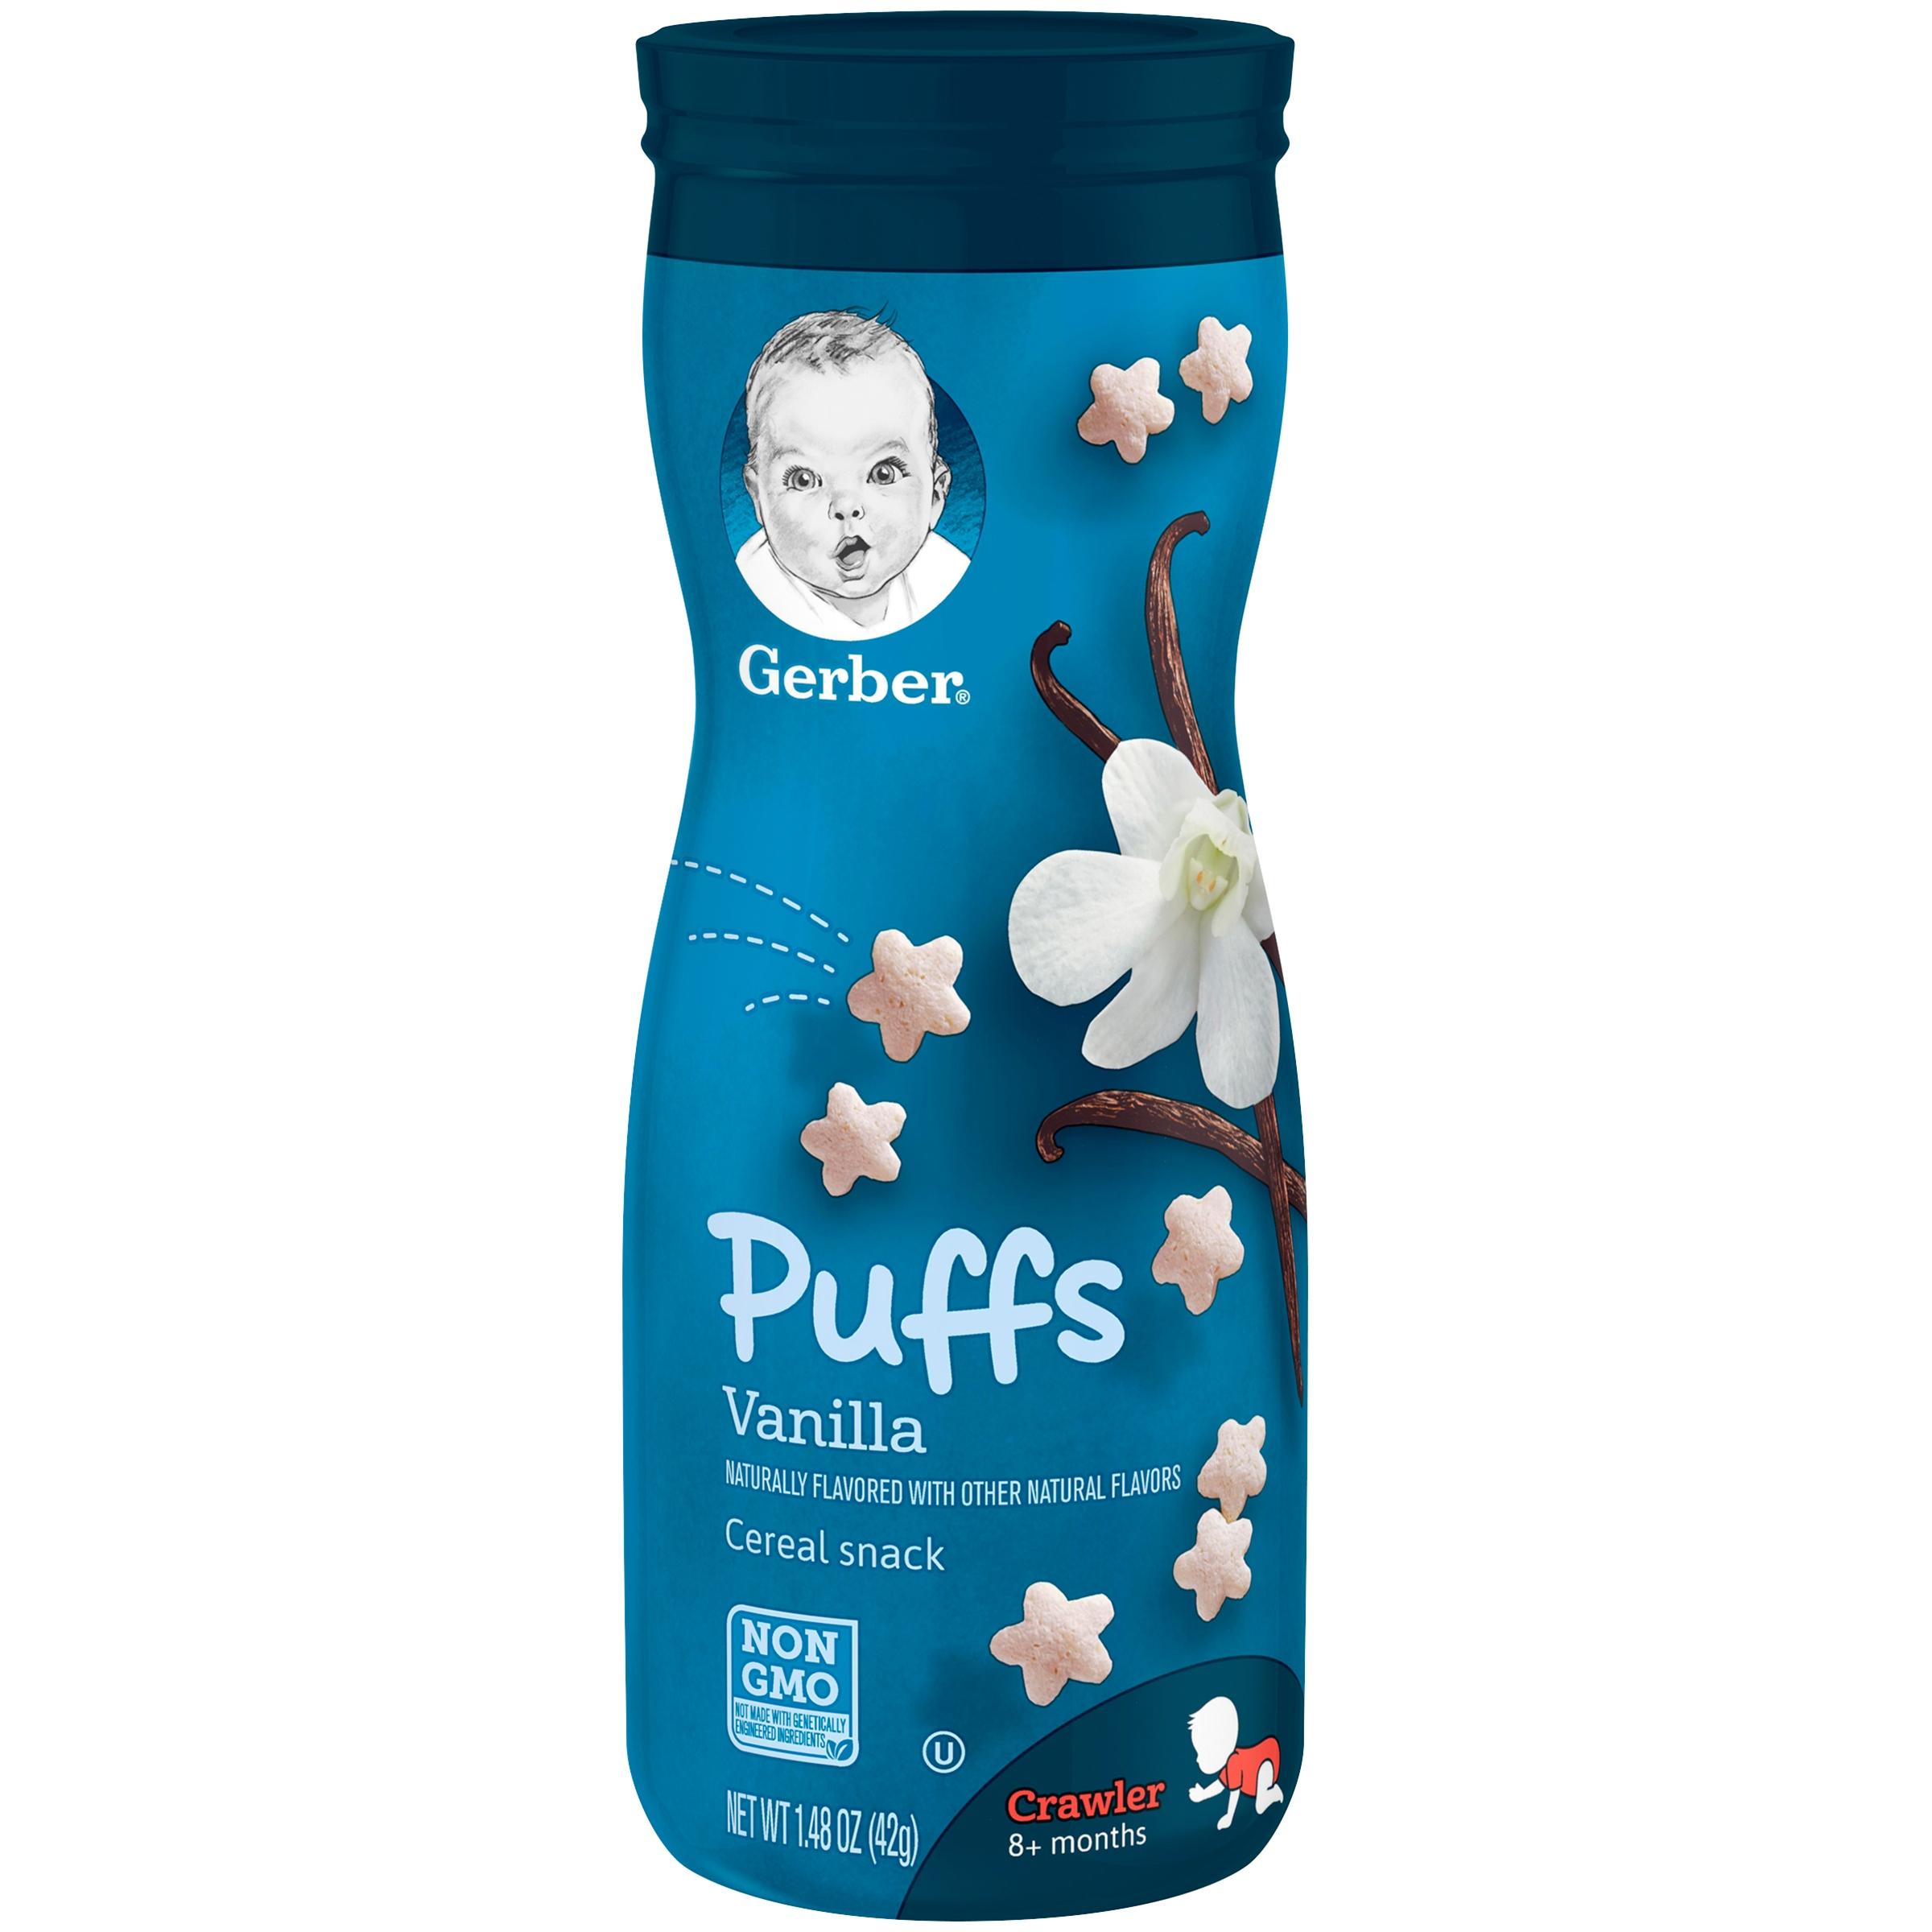 Puffs Cereal Snack Vanilla